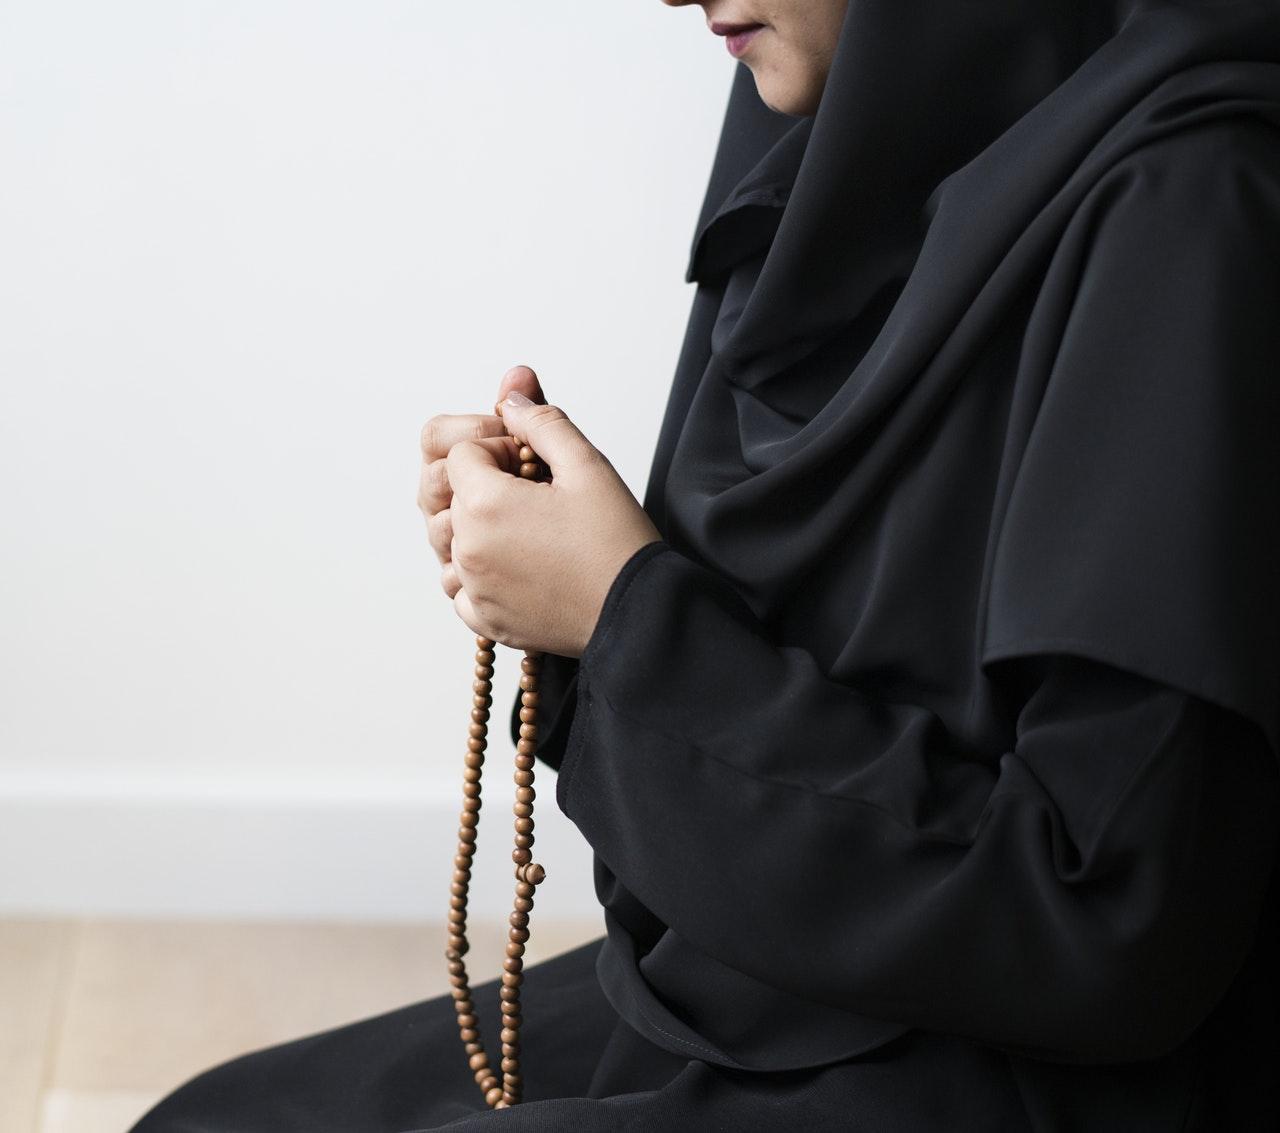 Teladan Ibu Hebat Sa'ad bin Mu'adz